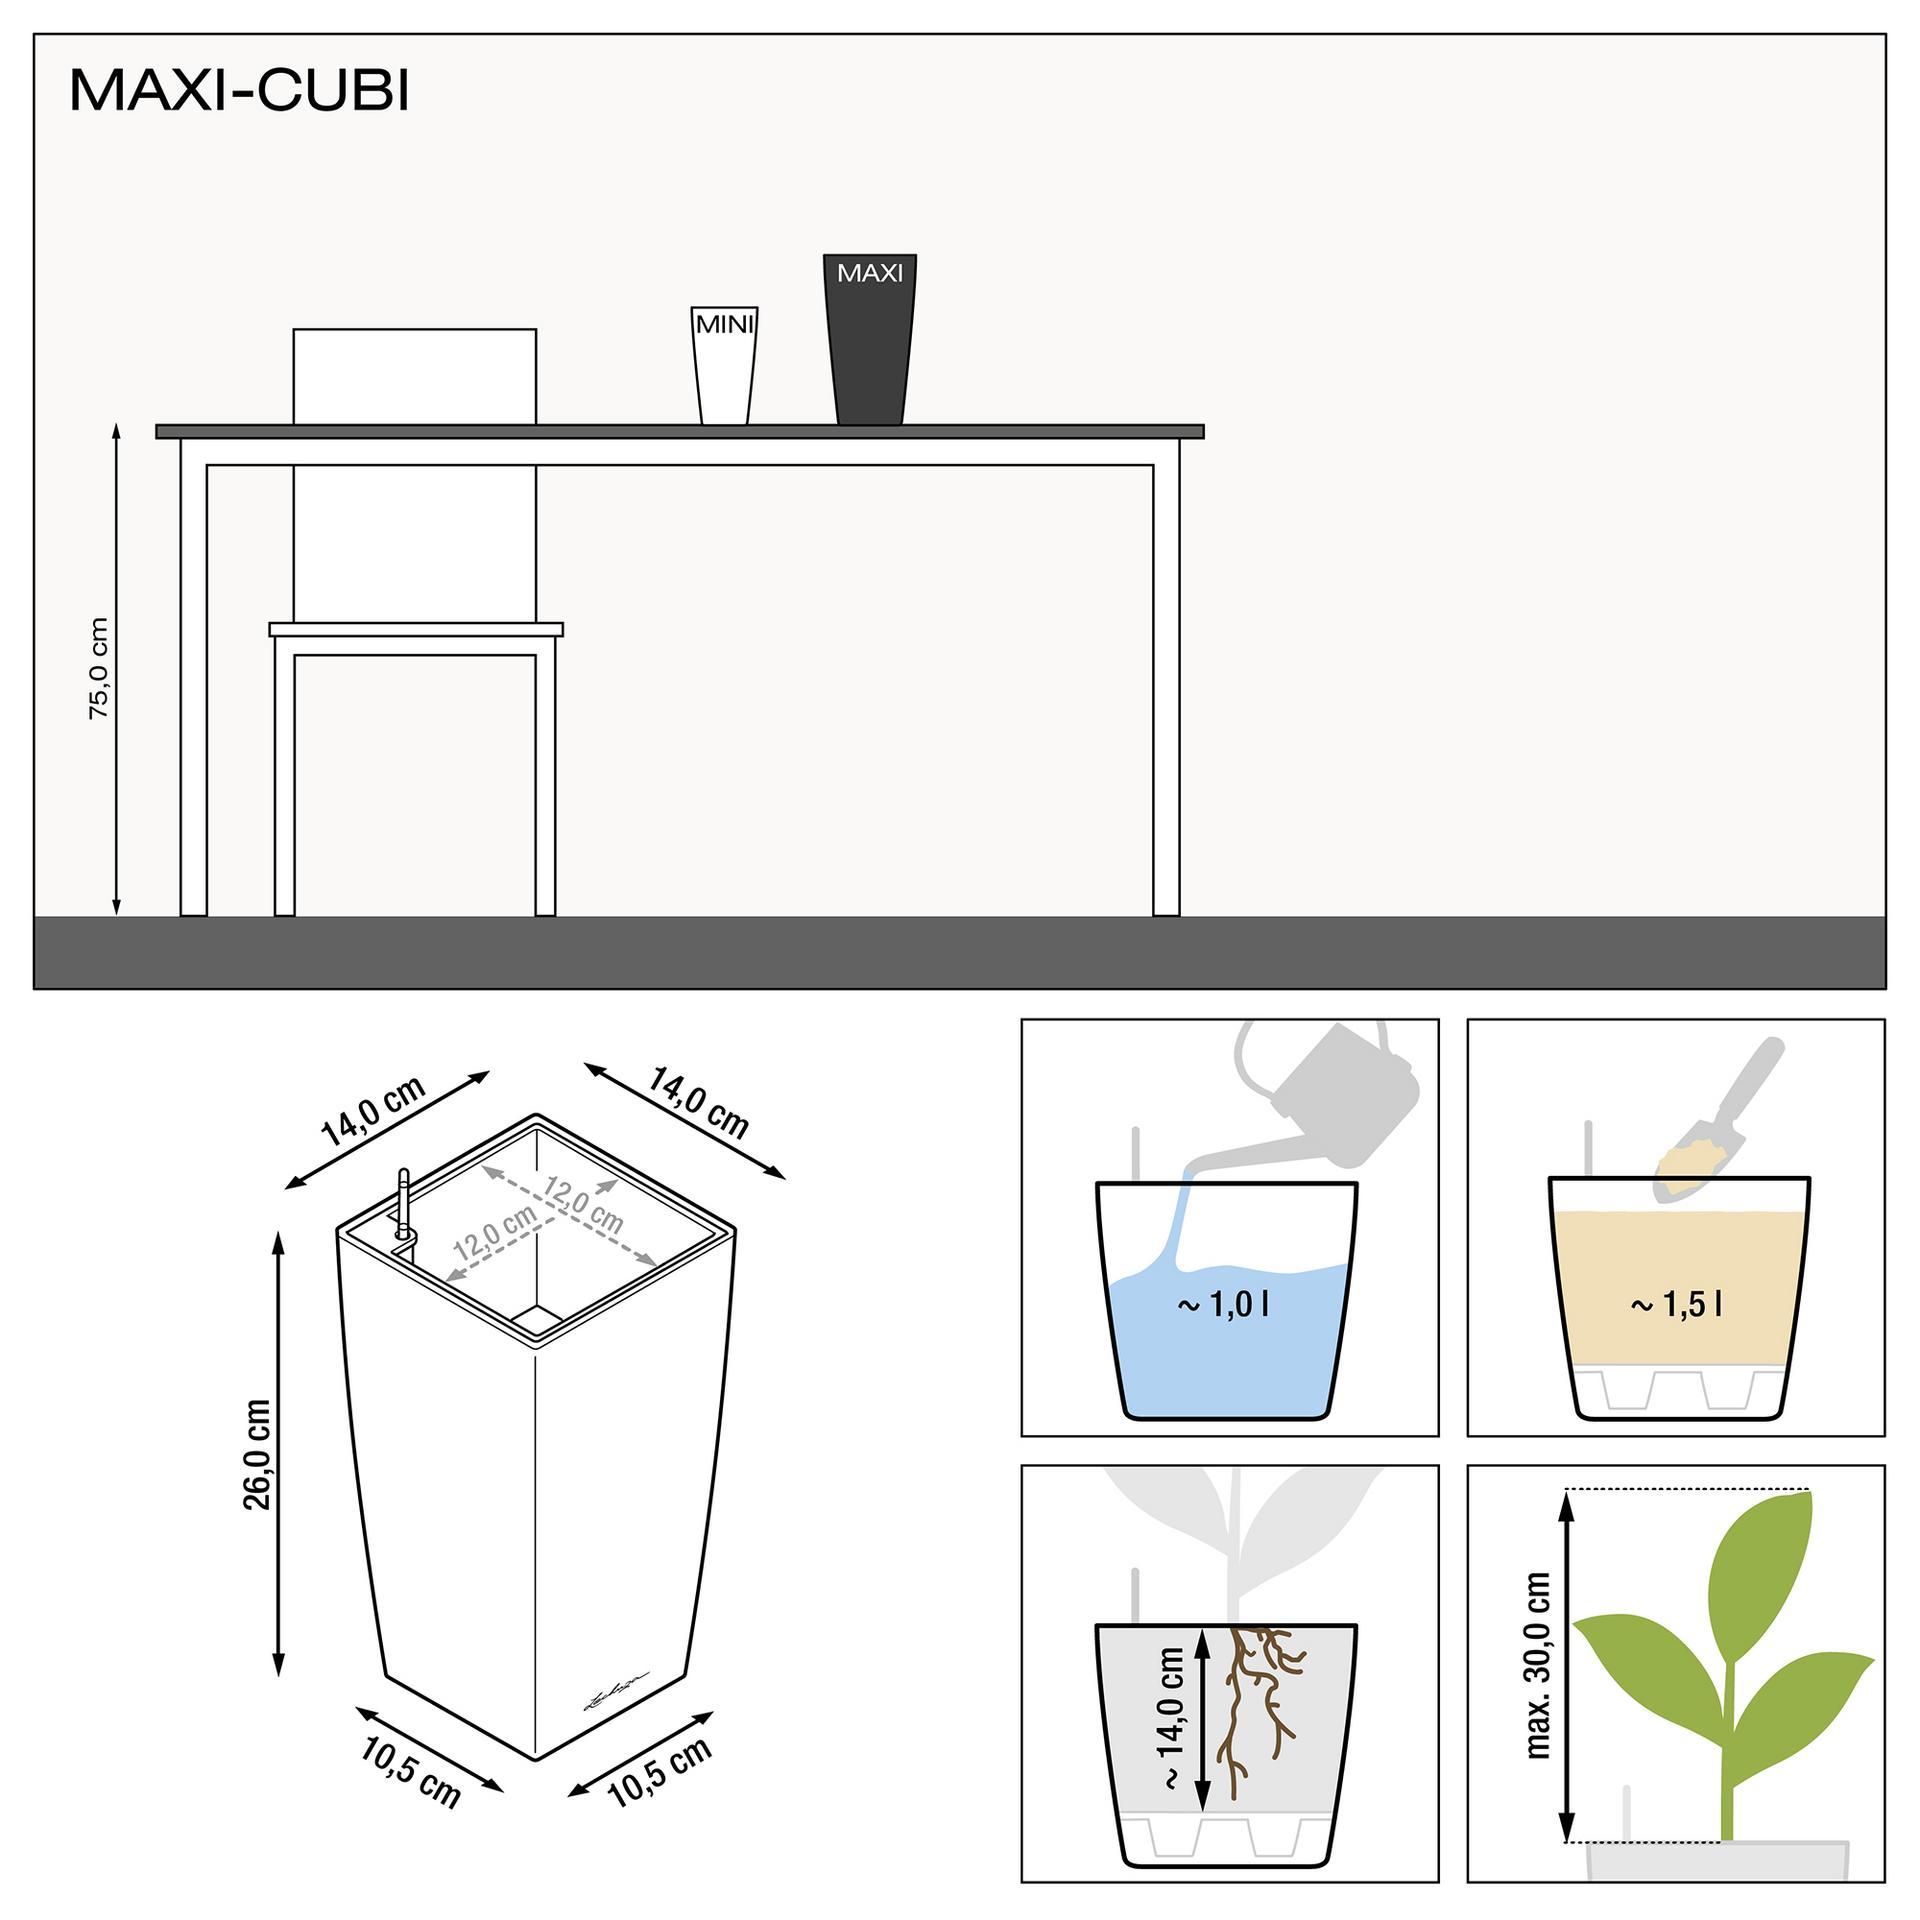 le_maxicubi_product_addi_nz